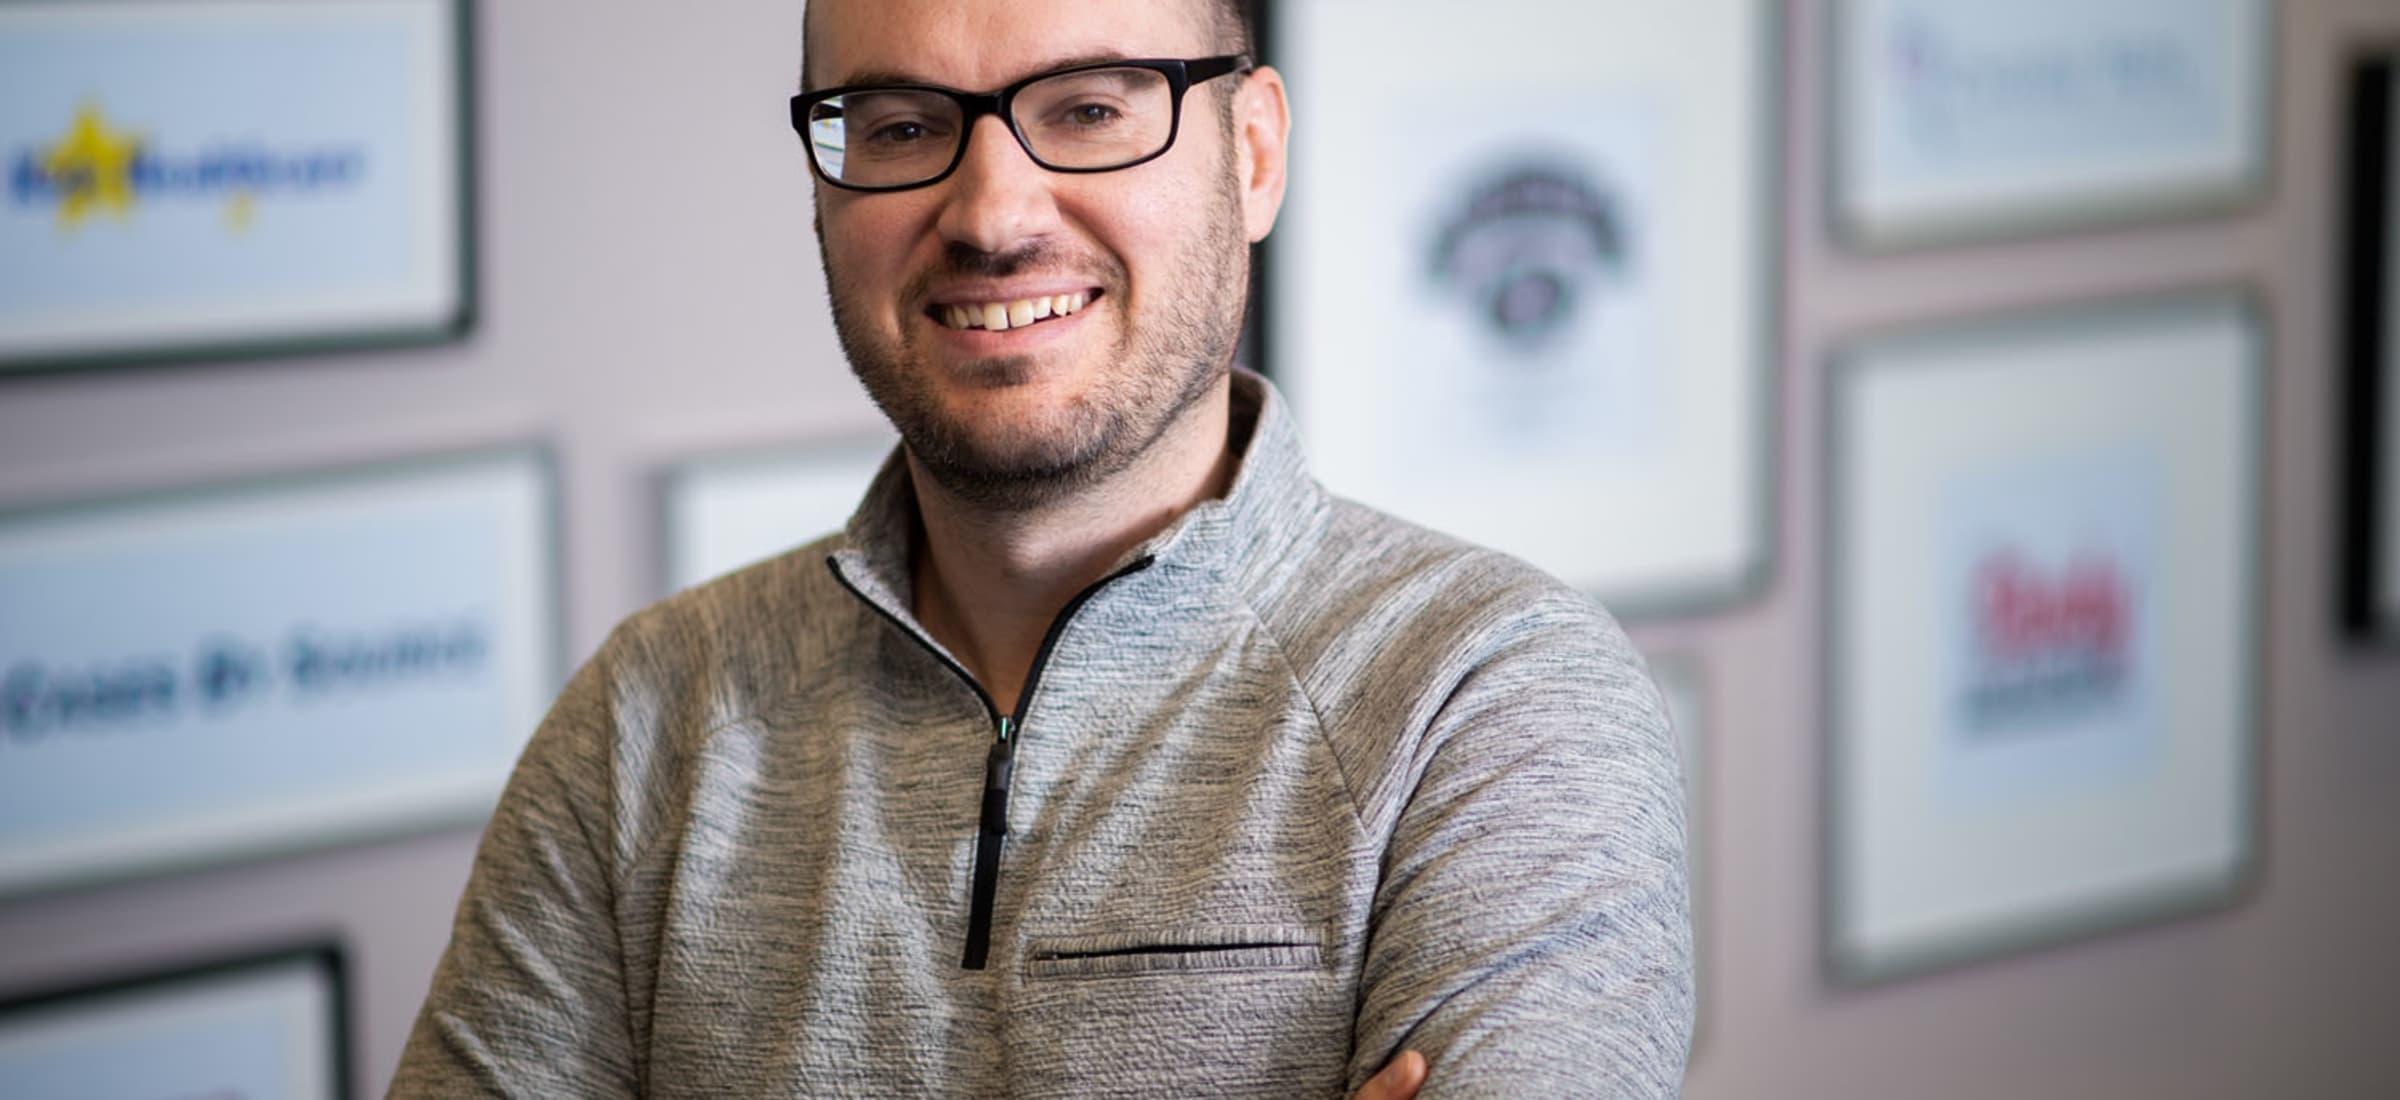 Acumium Software Development Manager Josh DePeau